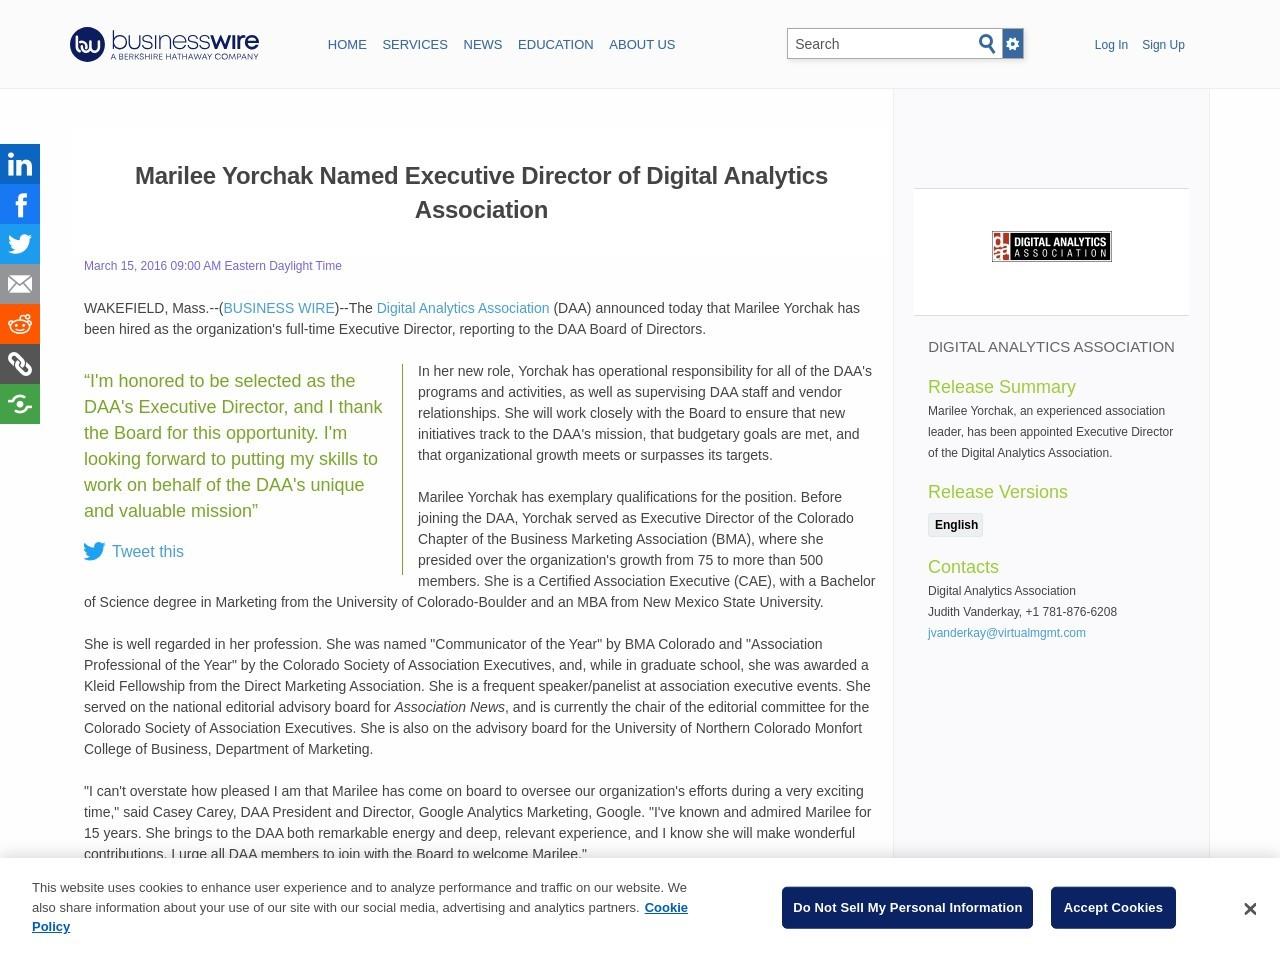 Marilee Yorchak Named Executive Director of Digital Analytics Association